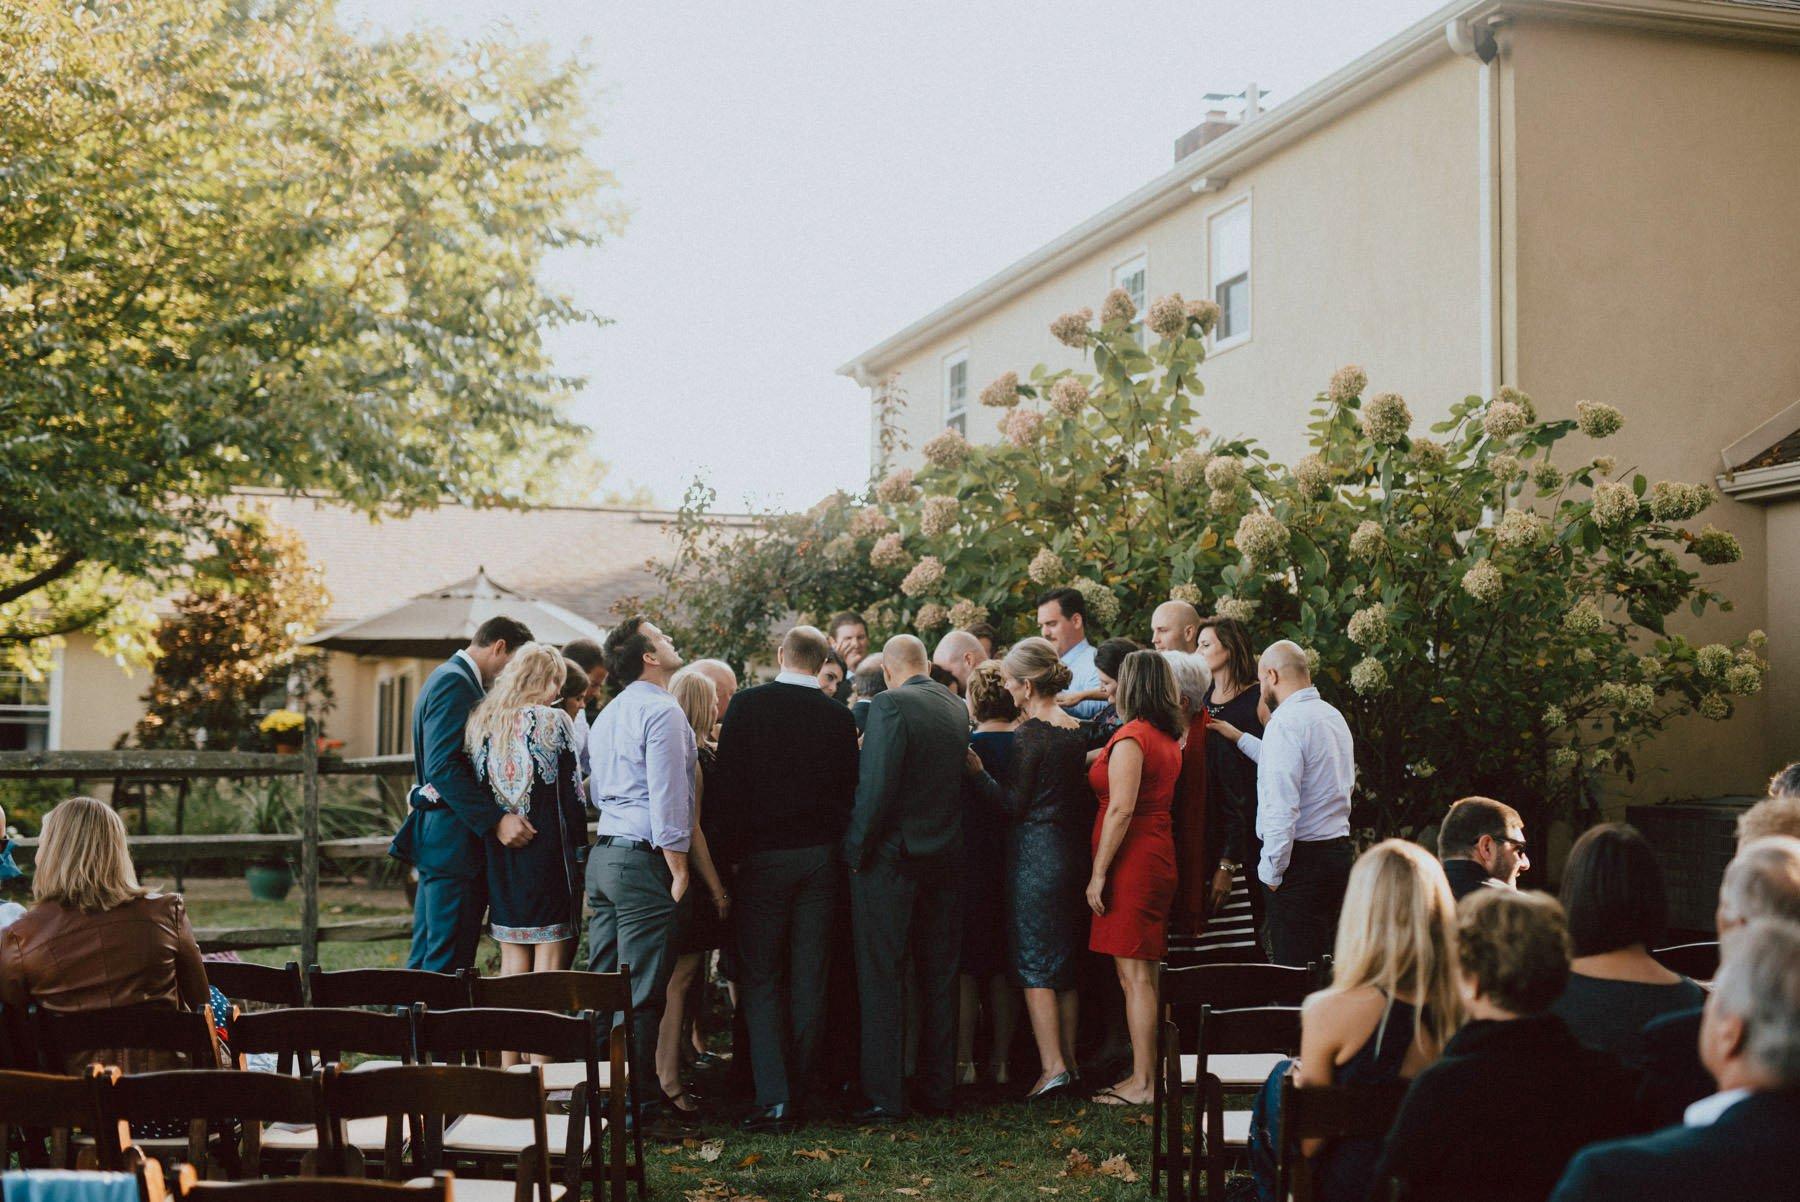 faunbrook-bed-and-breakfast-wedding-68.jpg